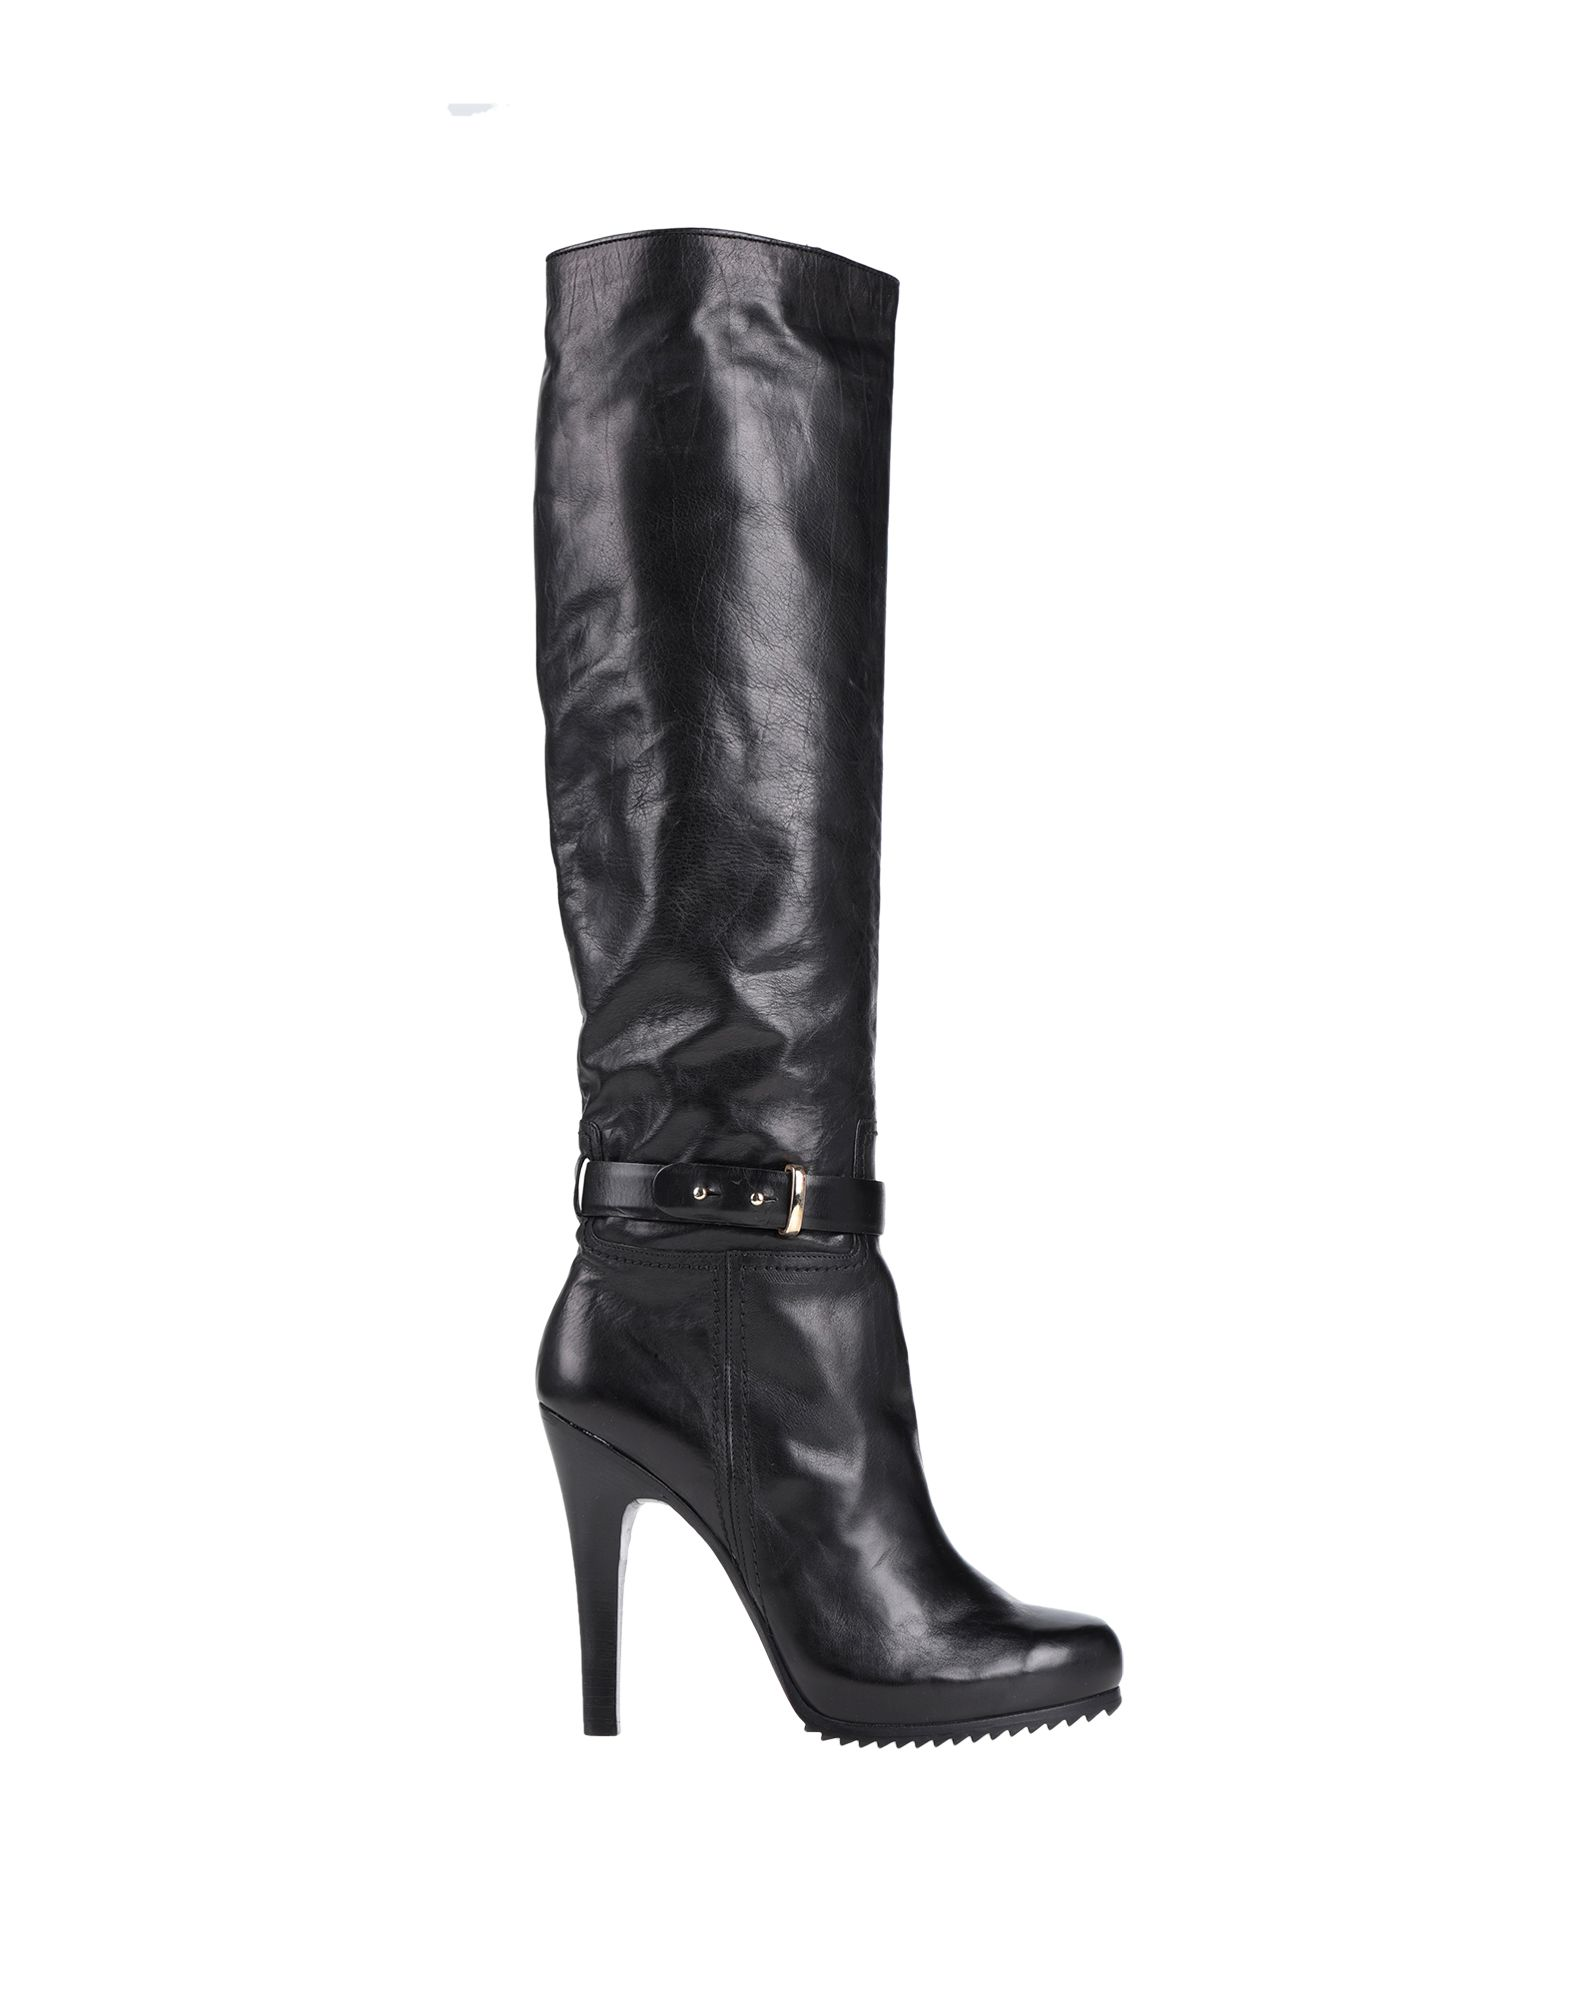 Barbara Bui Boots BOOTS